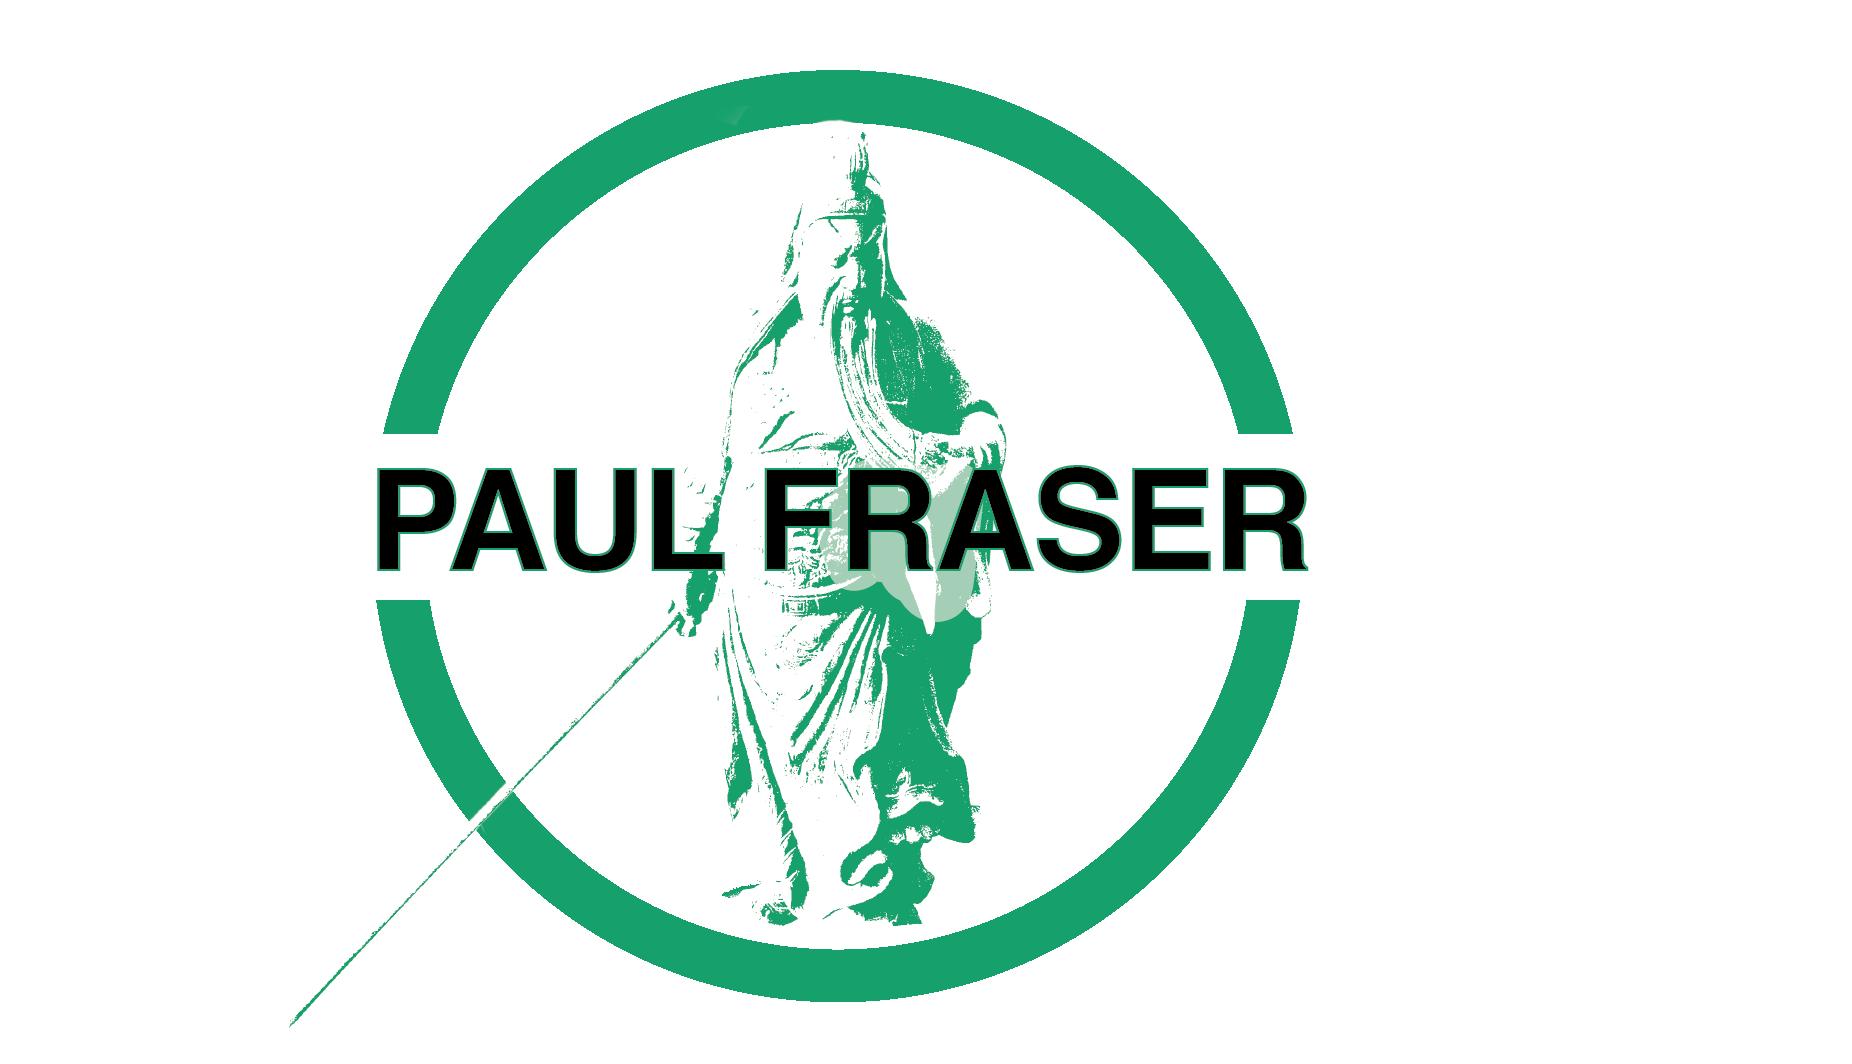 Paul Fraser Qigong